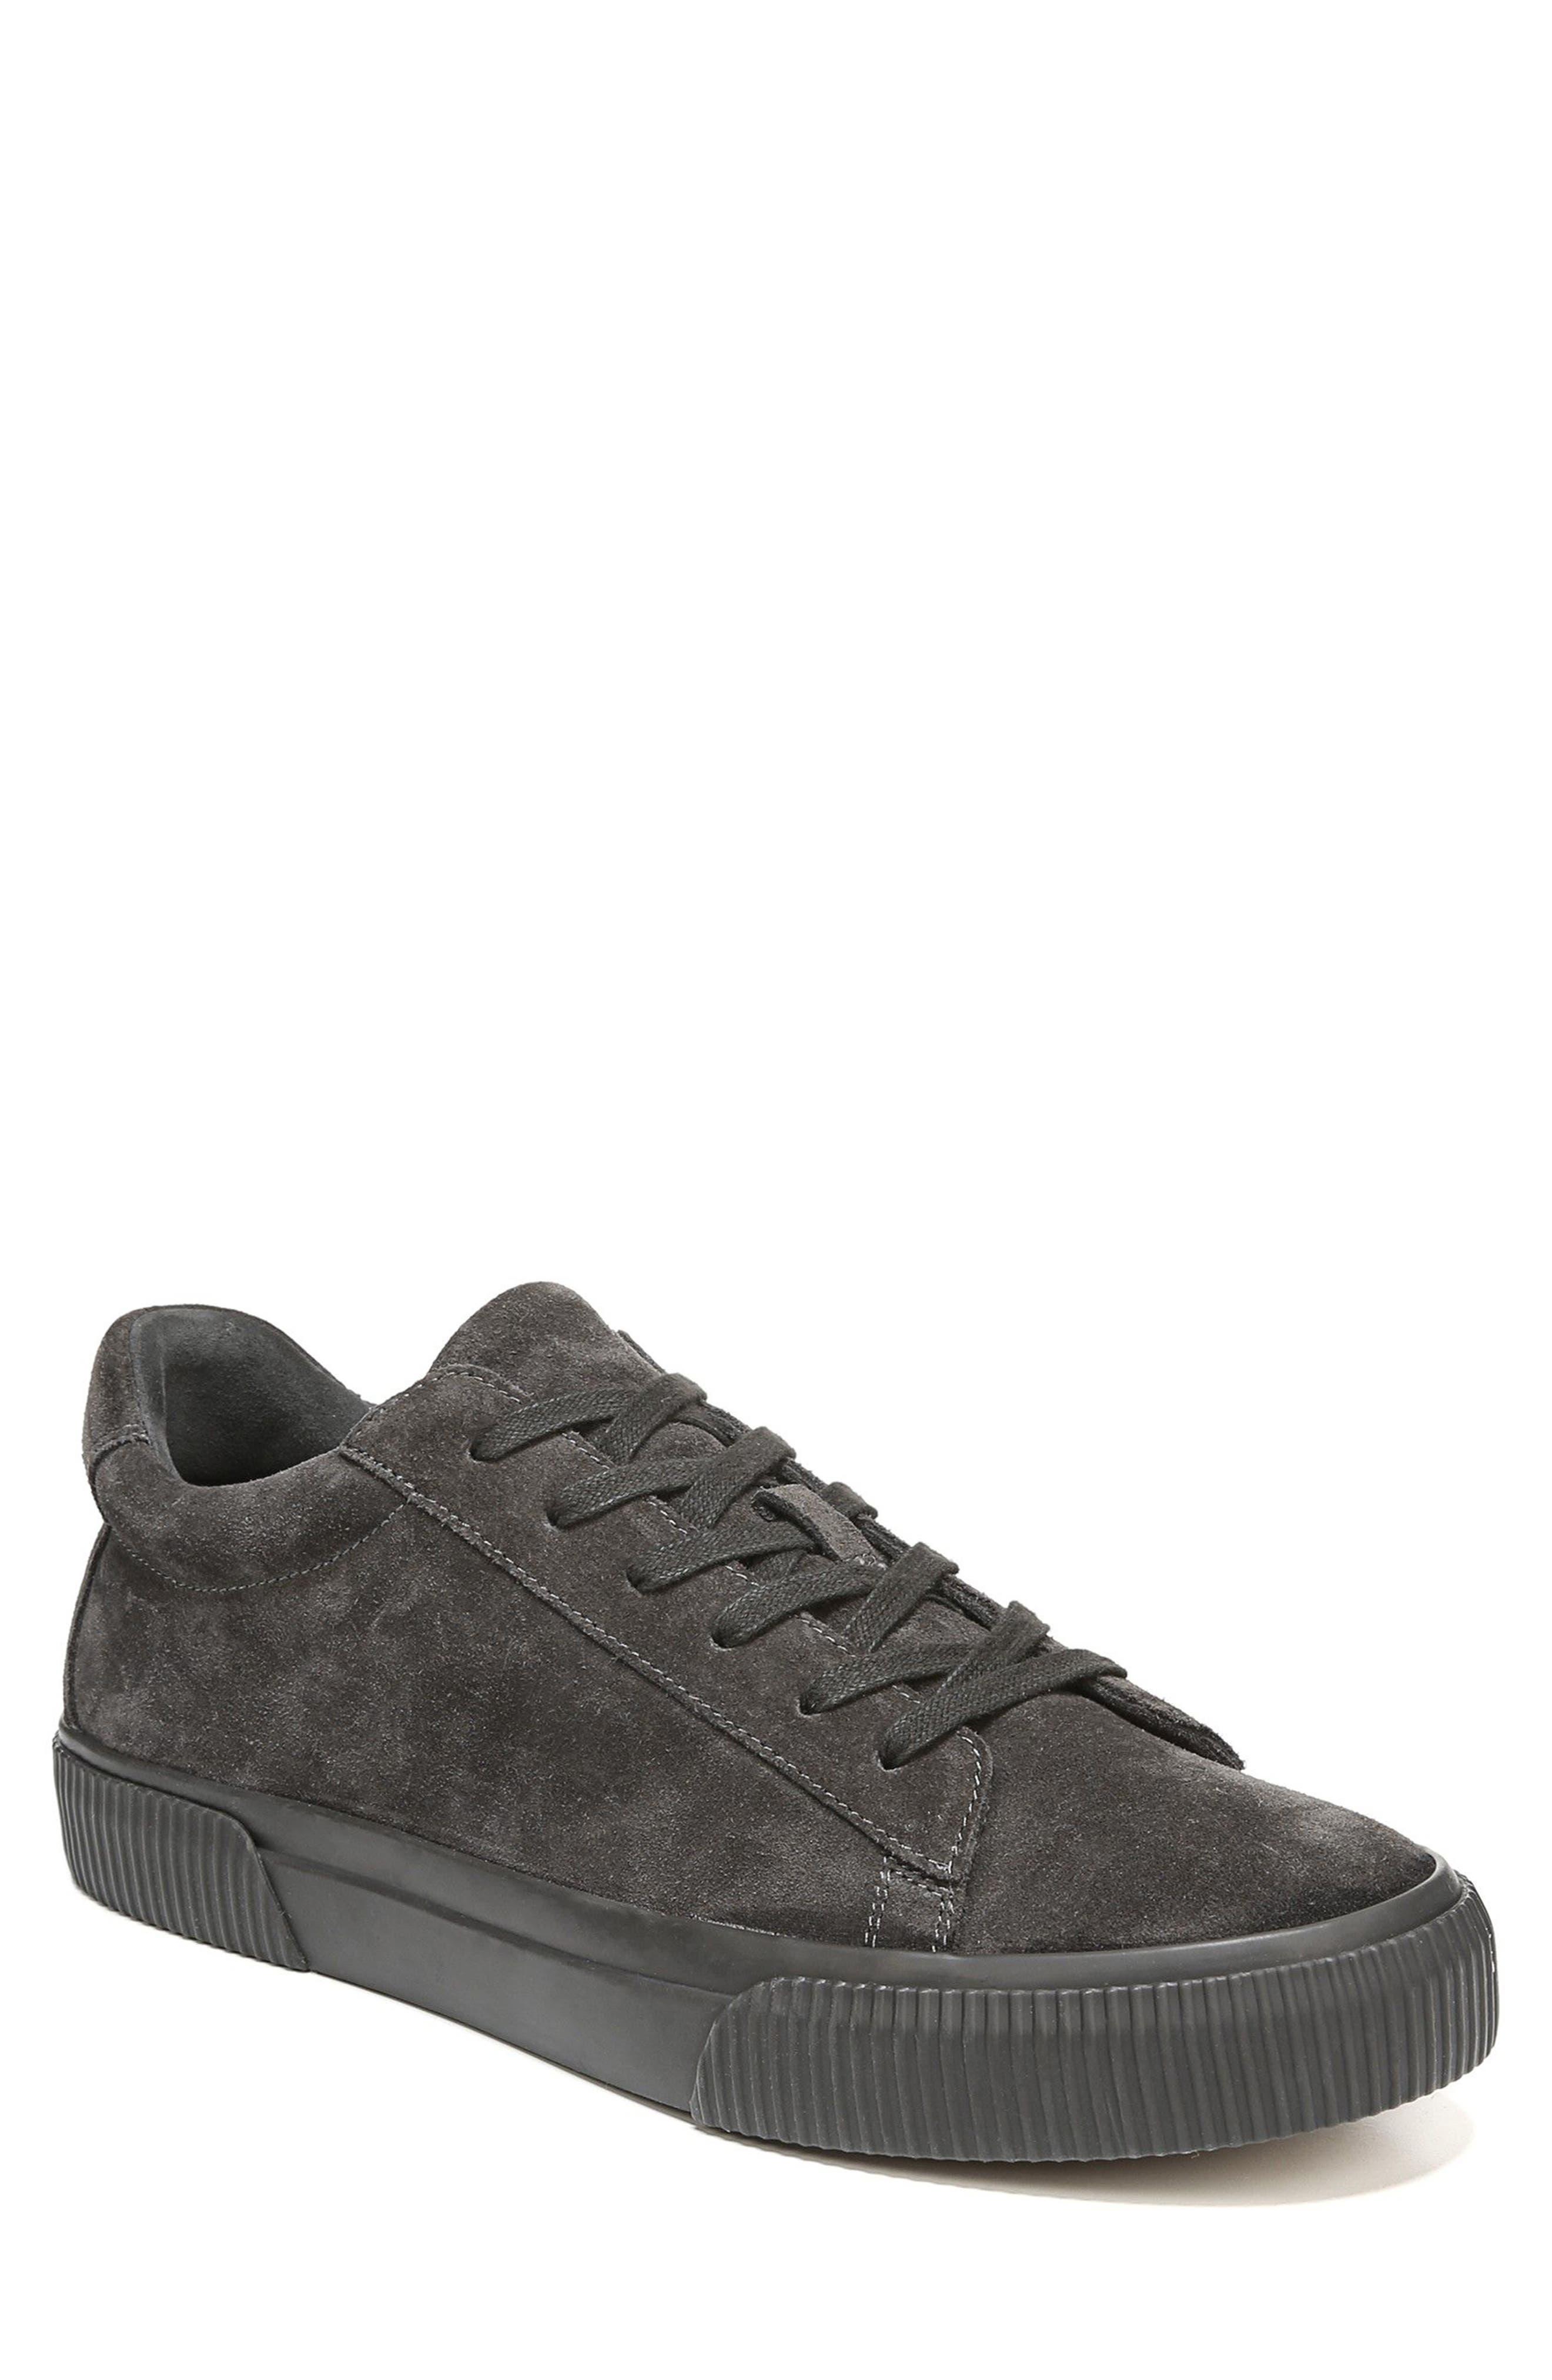 VINCE,                             Kurtis Sneaker,                             Main thumbnail 1, color,                             020